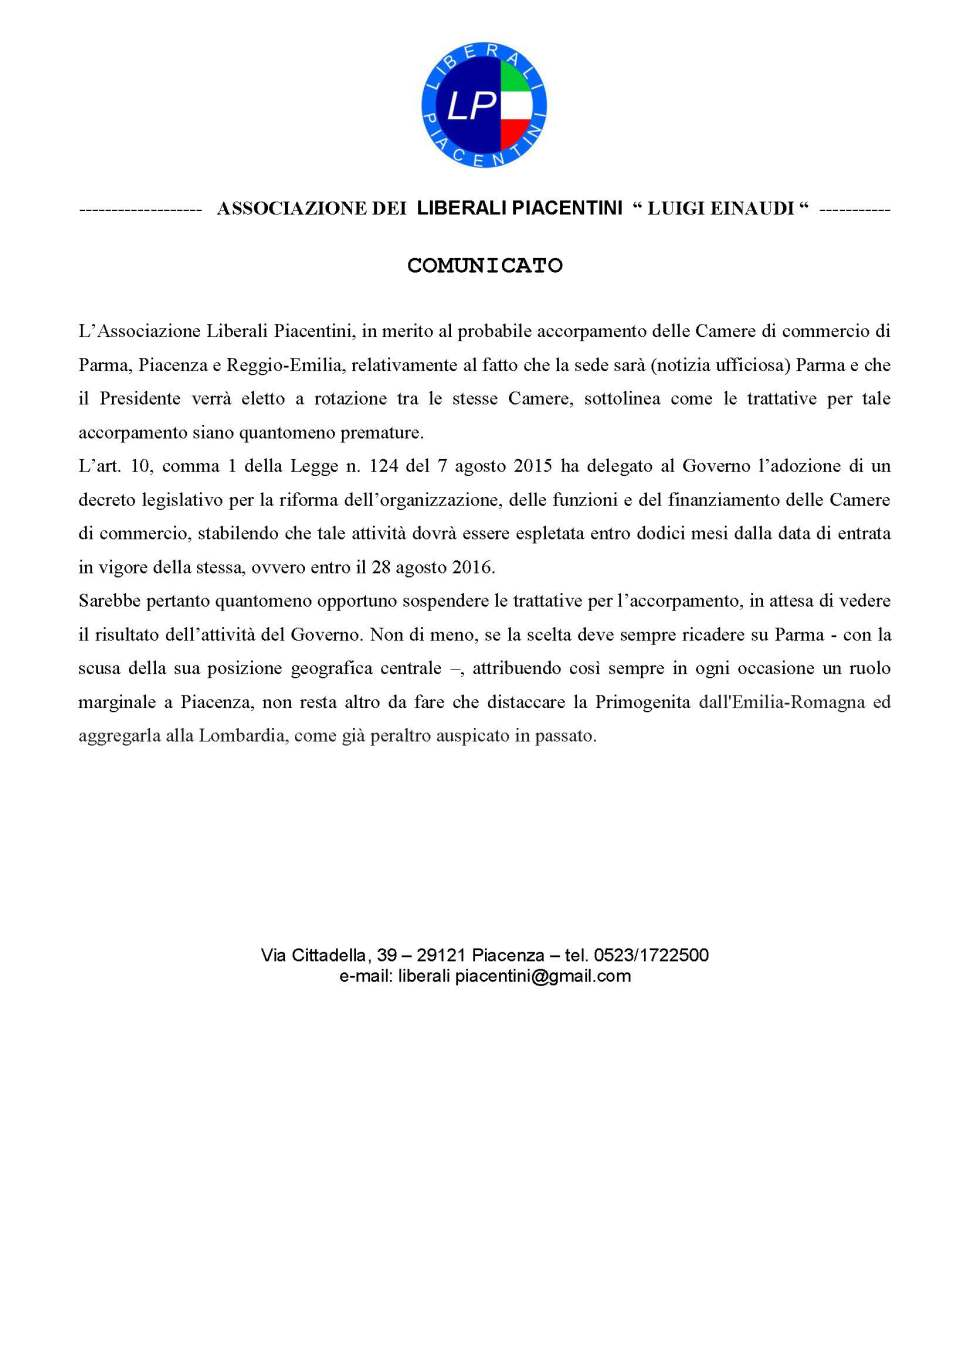 comunicato-08-08-2016